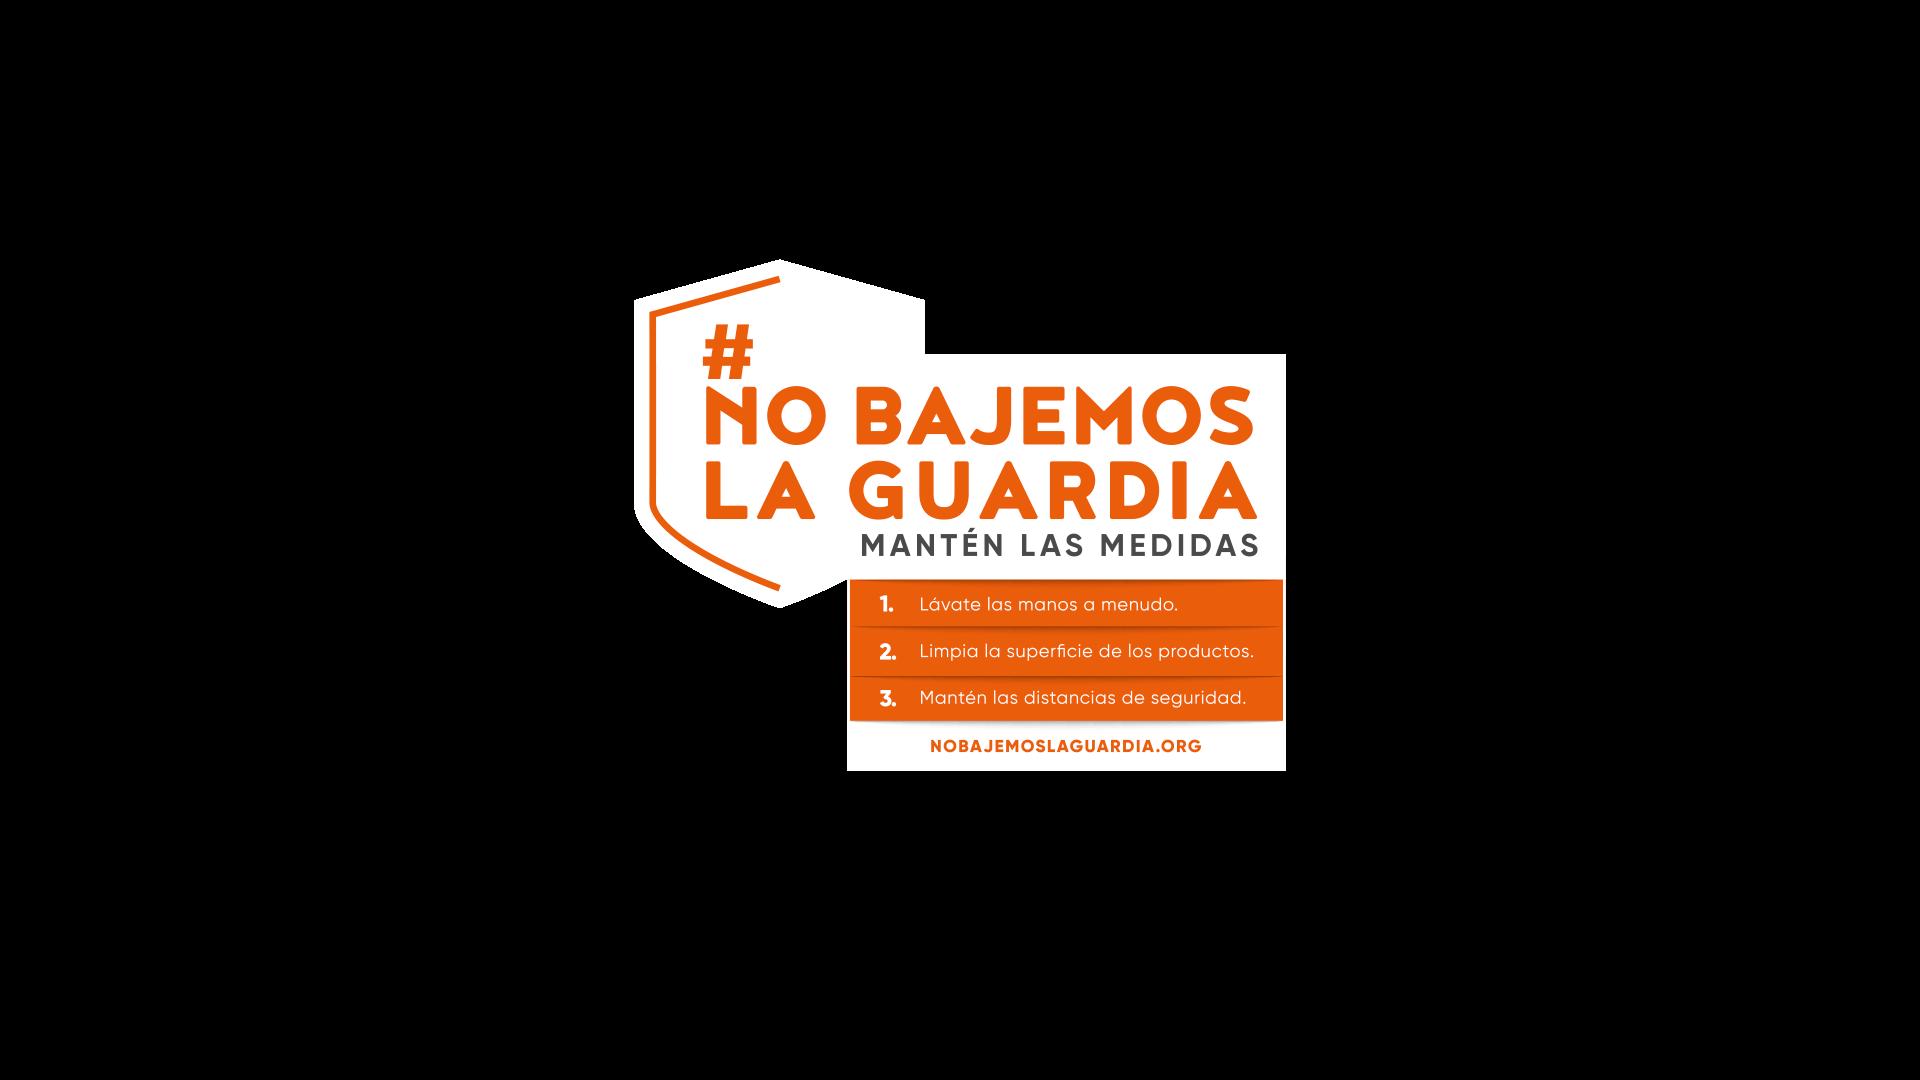 Foto de Logotipo de la campaña #nobajemoslaguardia